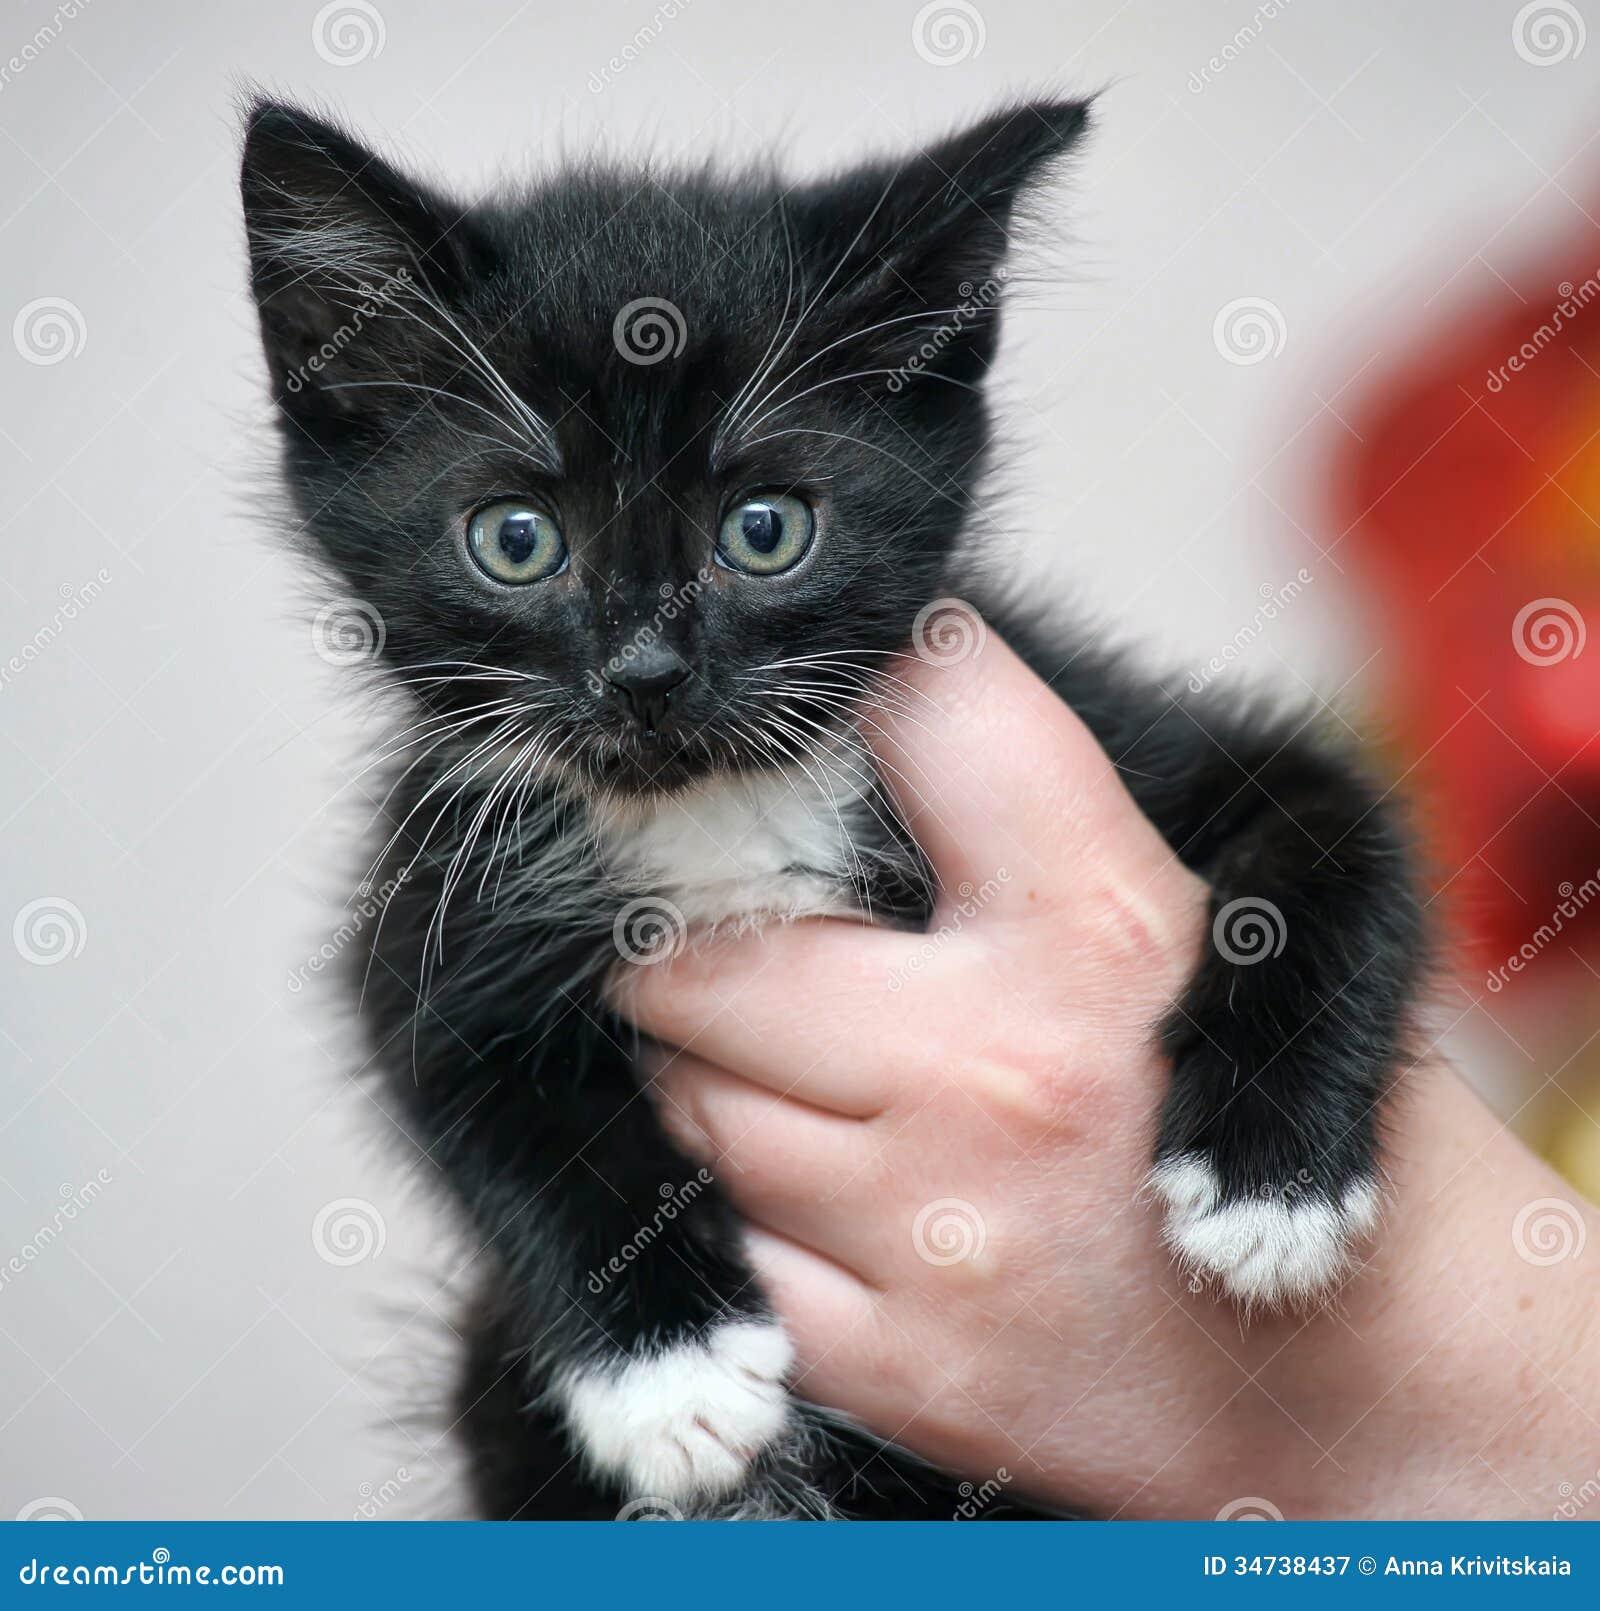 Little Cute Kitten Royalty Free Stock graphy Image